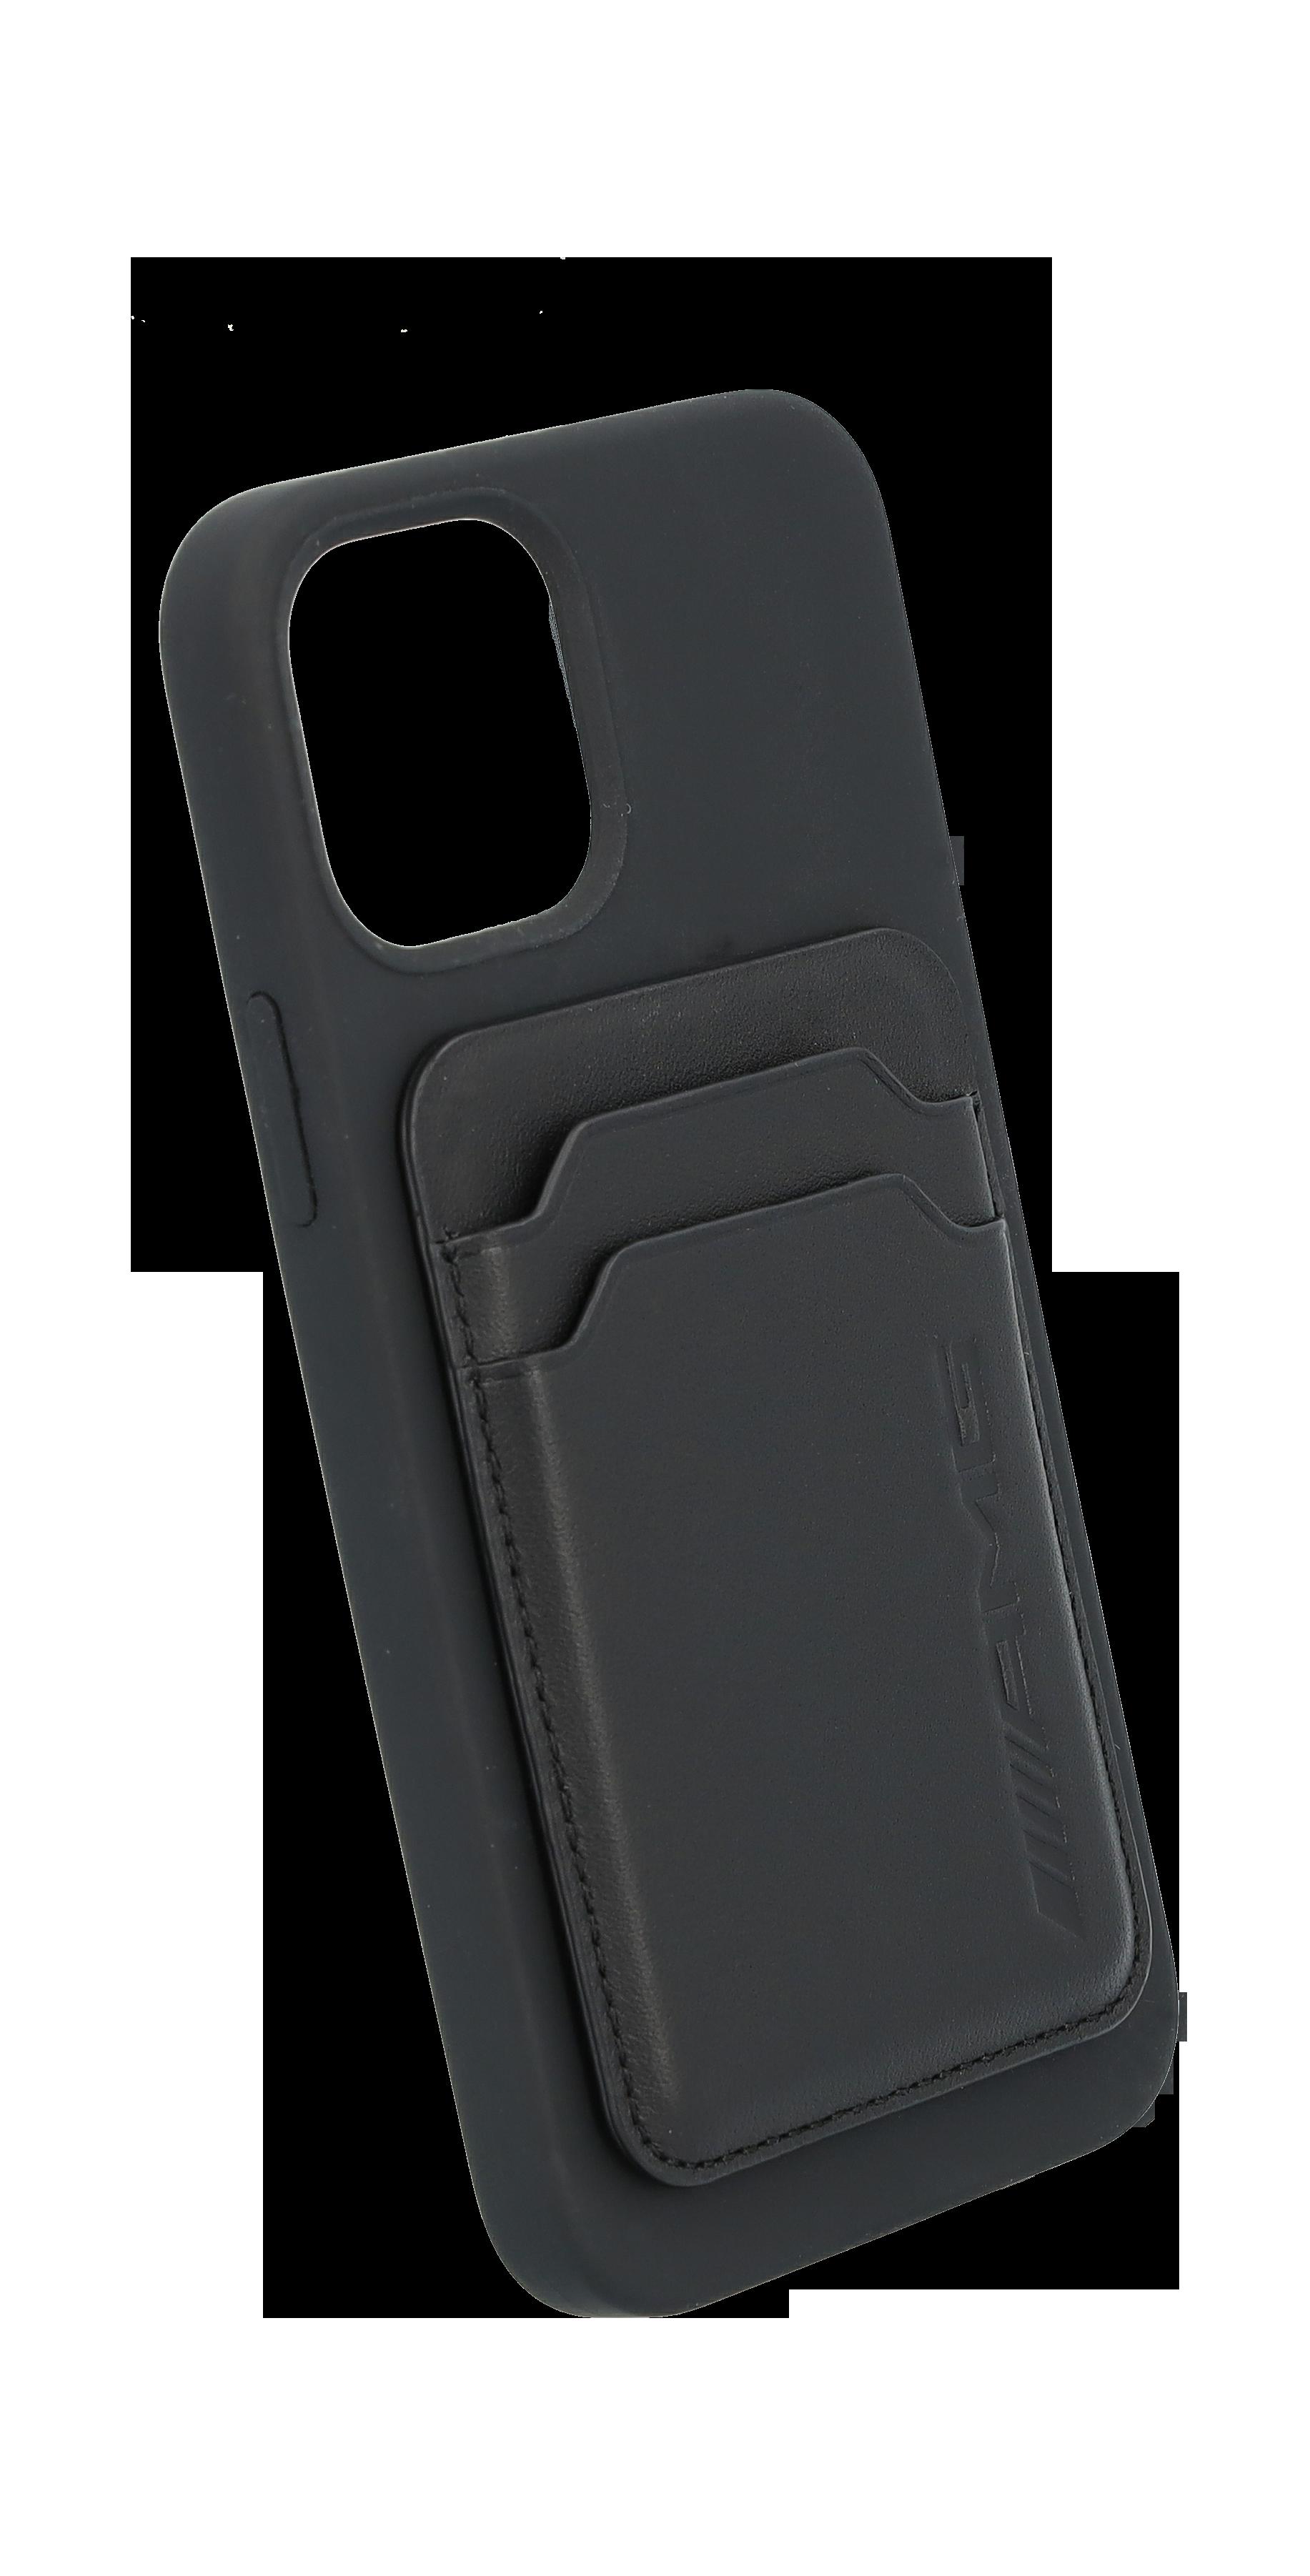 AMG-hoes iPhone® 12 Pro/iPhone® 12, Met creditcardvak